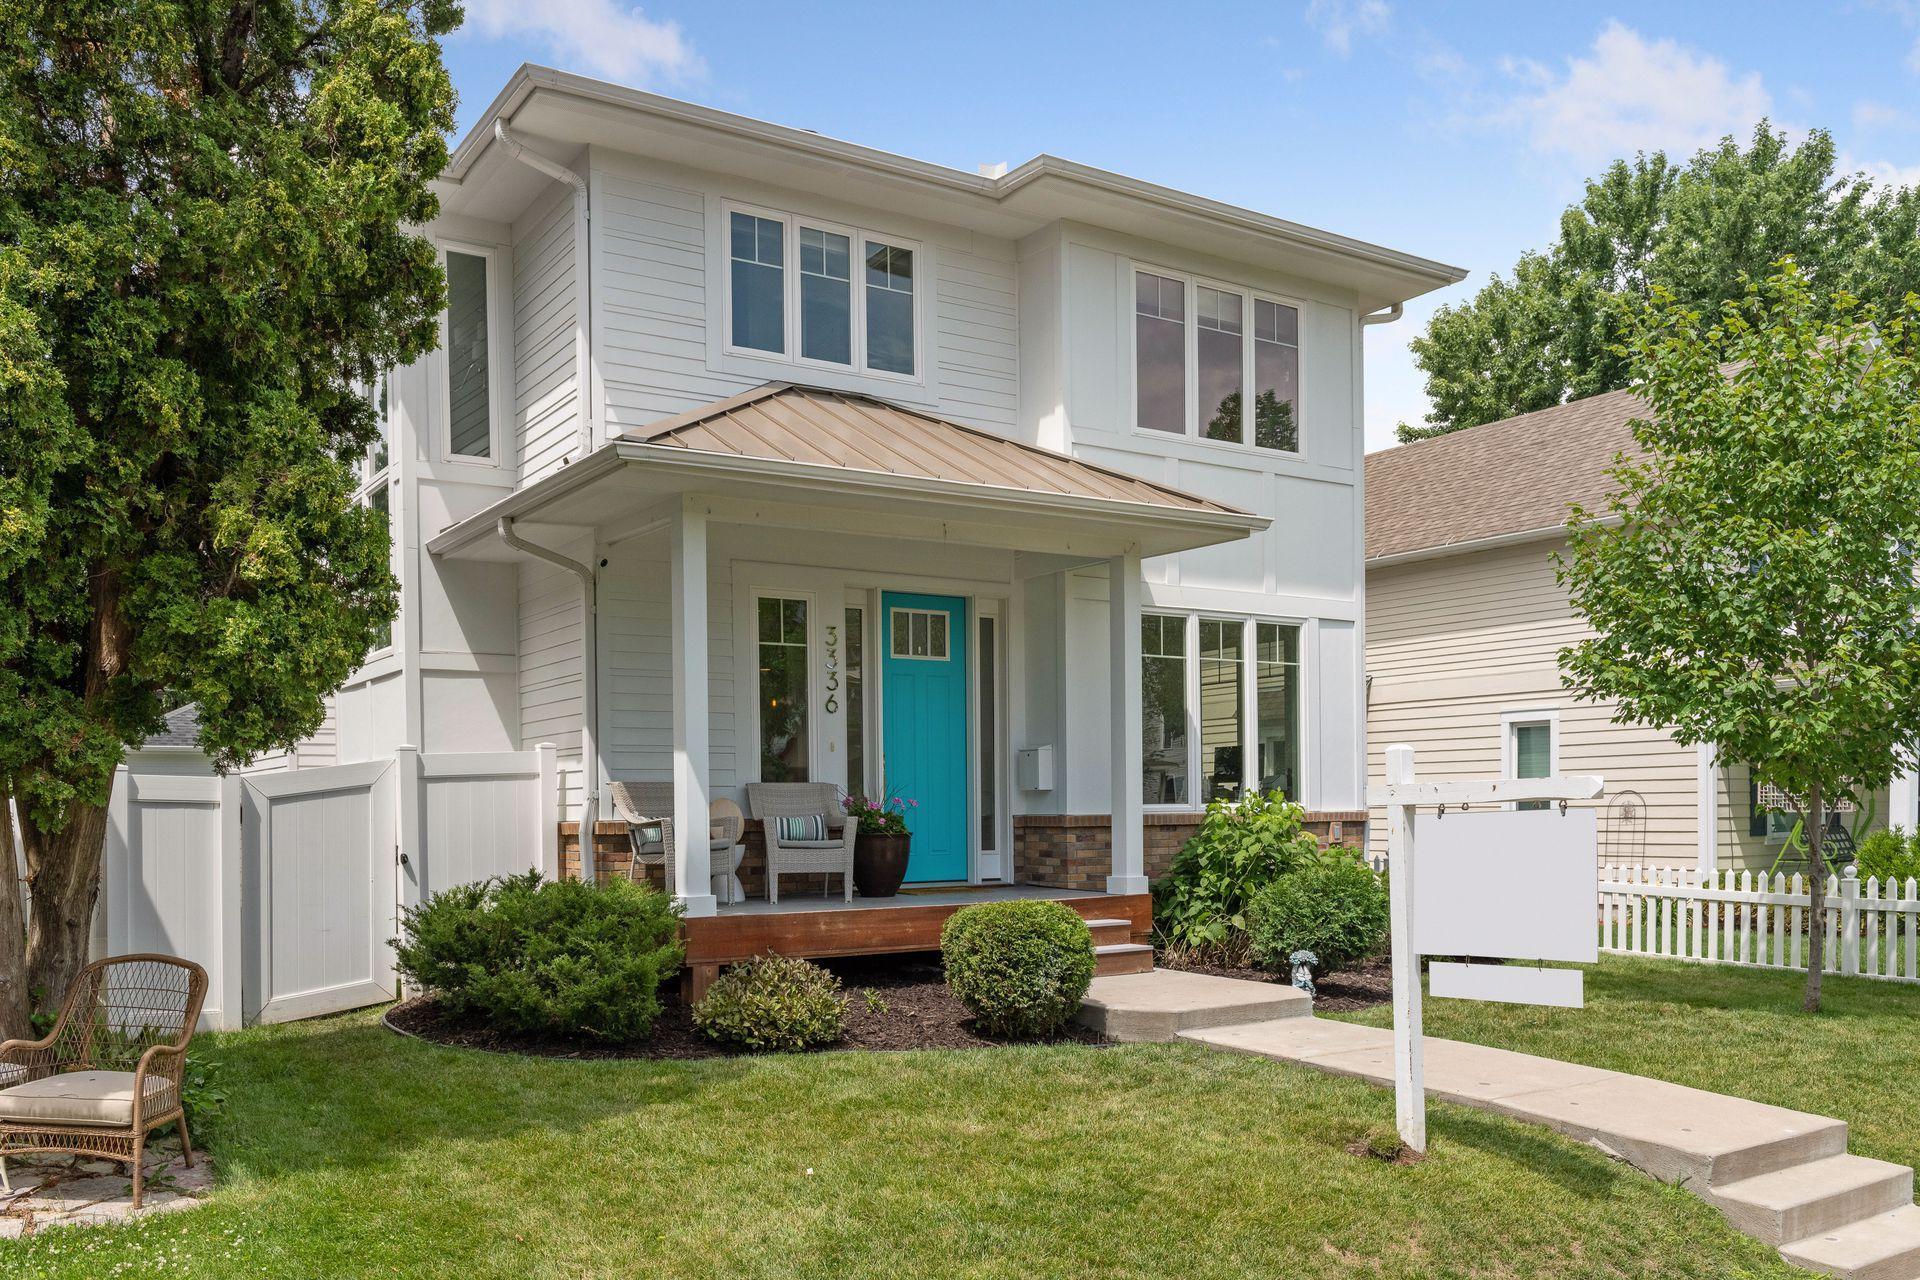 3336 Humboldt Avenue S Property Photo - Minneapolis, MN real estate listing